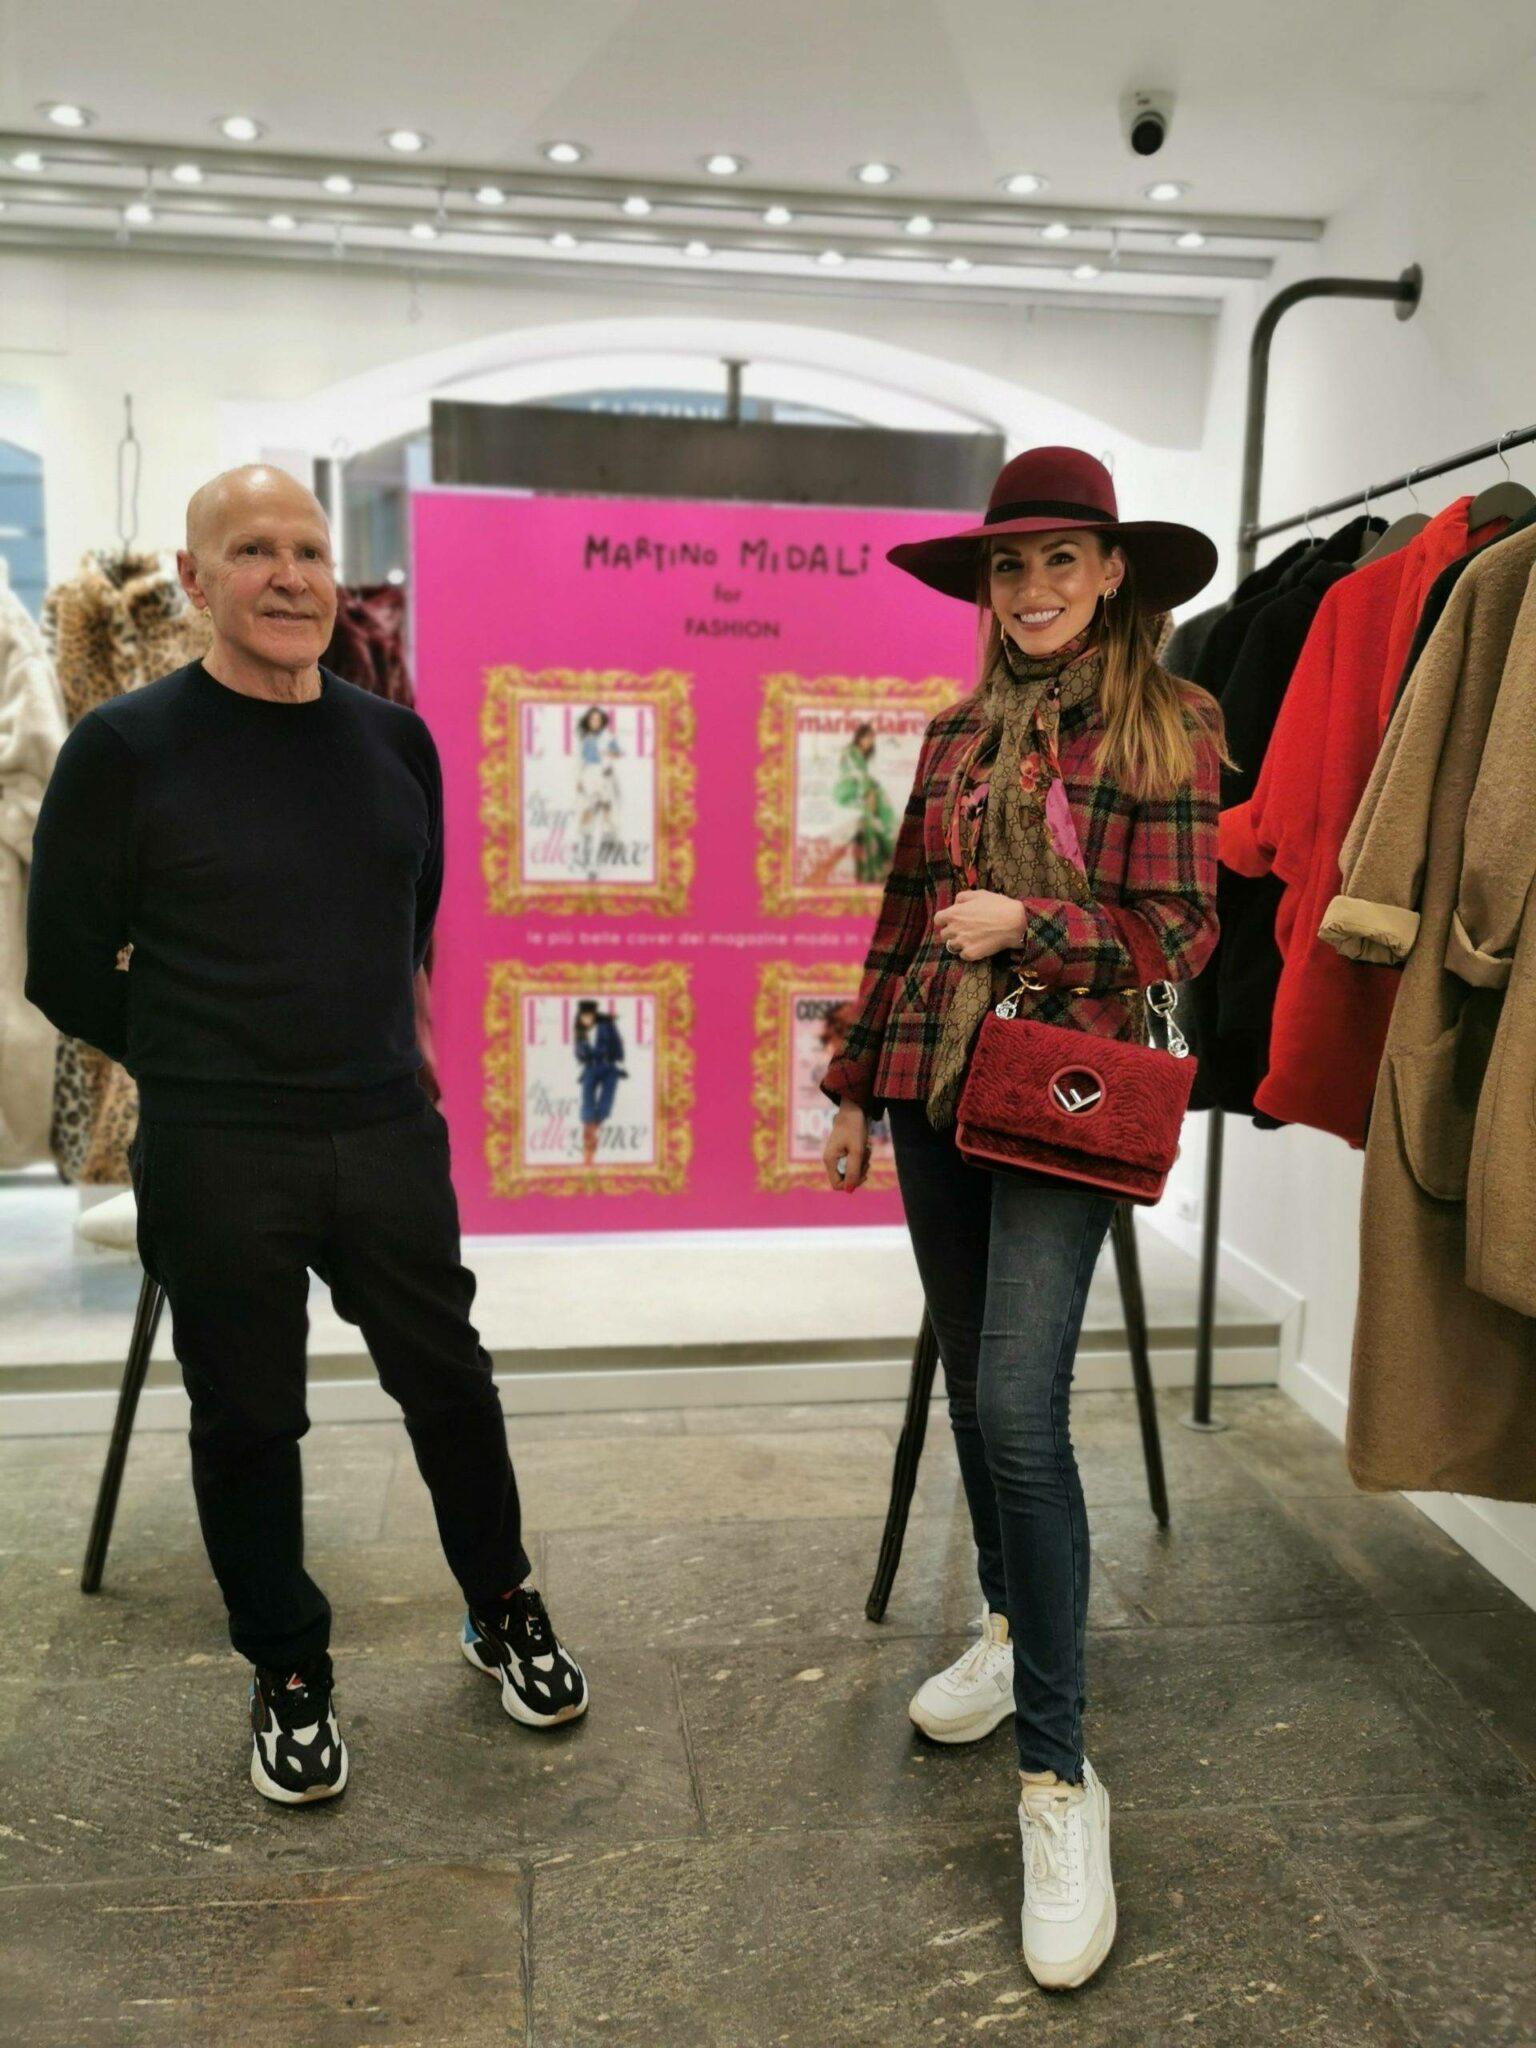 Izabela Switon-Kulinska (bella_zofia) with Martino Midali.  Martino Midali for Fashion, Milan Fashion Week FW 21/22